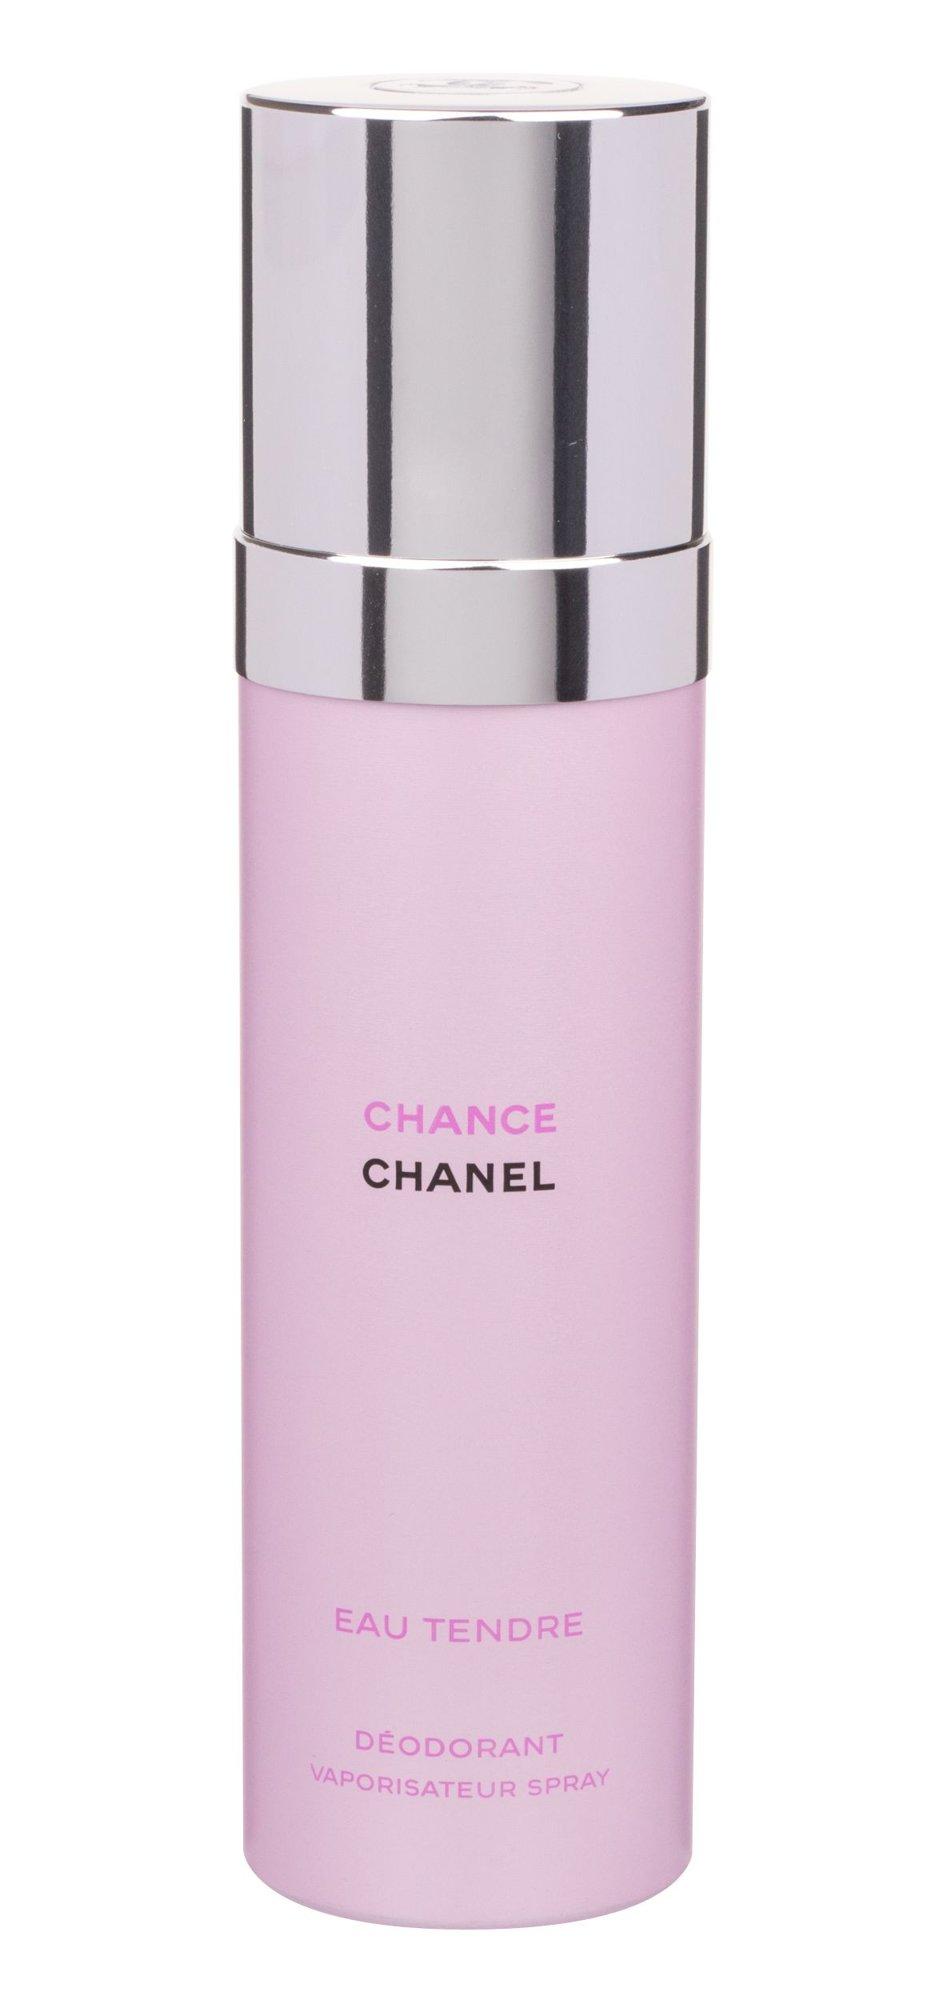 Chanel Chance Deodorant 100ml